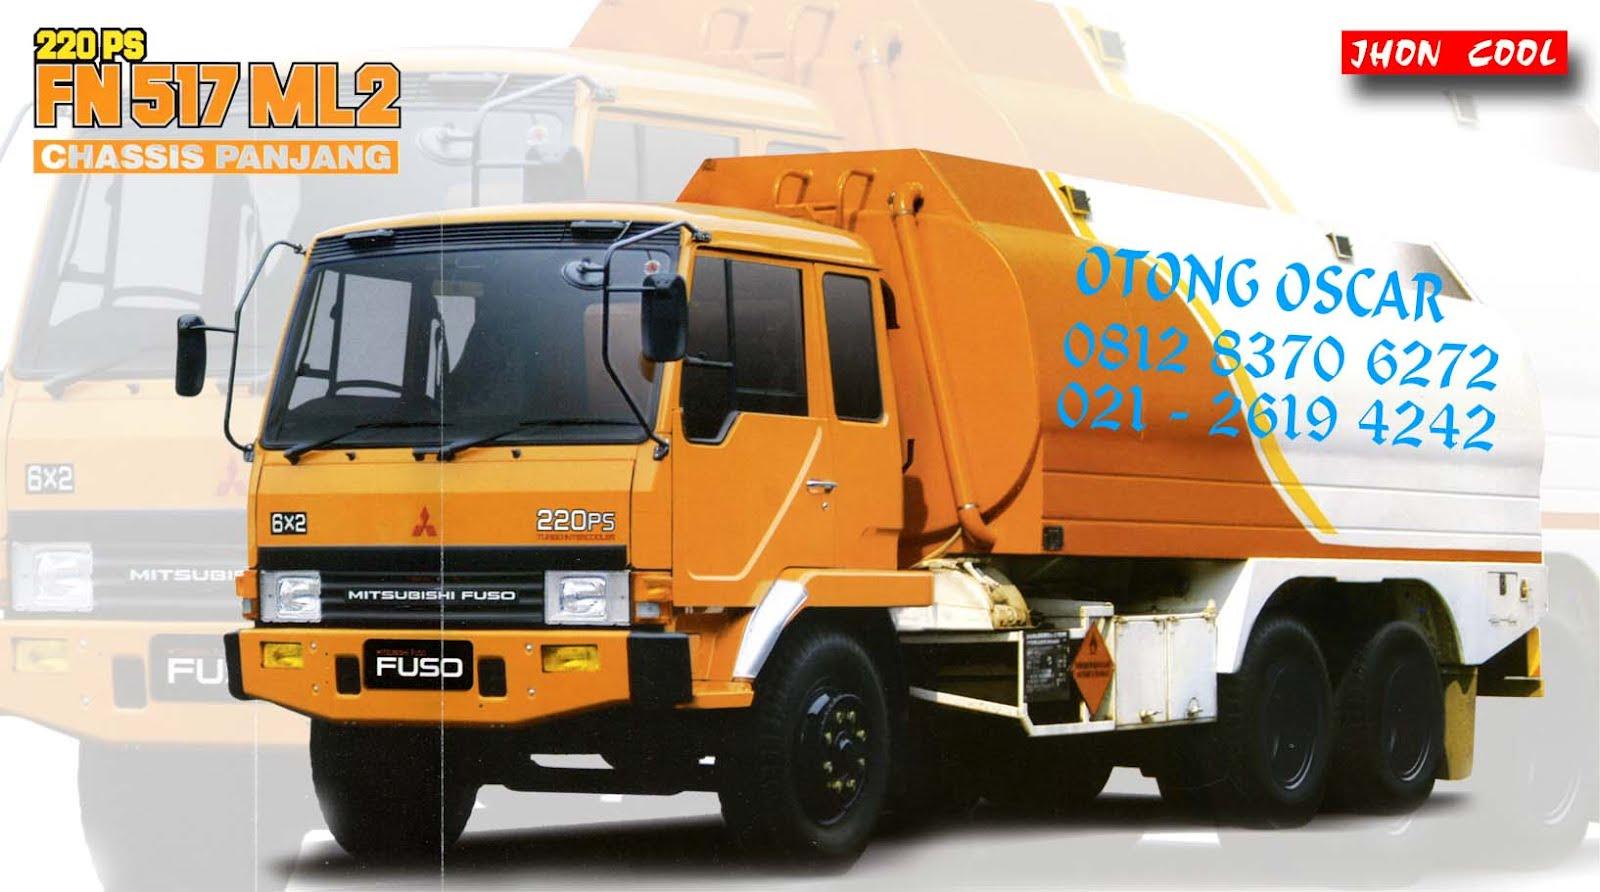 Fuso FM 517 ML 2 220 PS MITSUBISHI CANTER